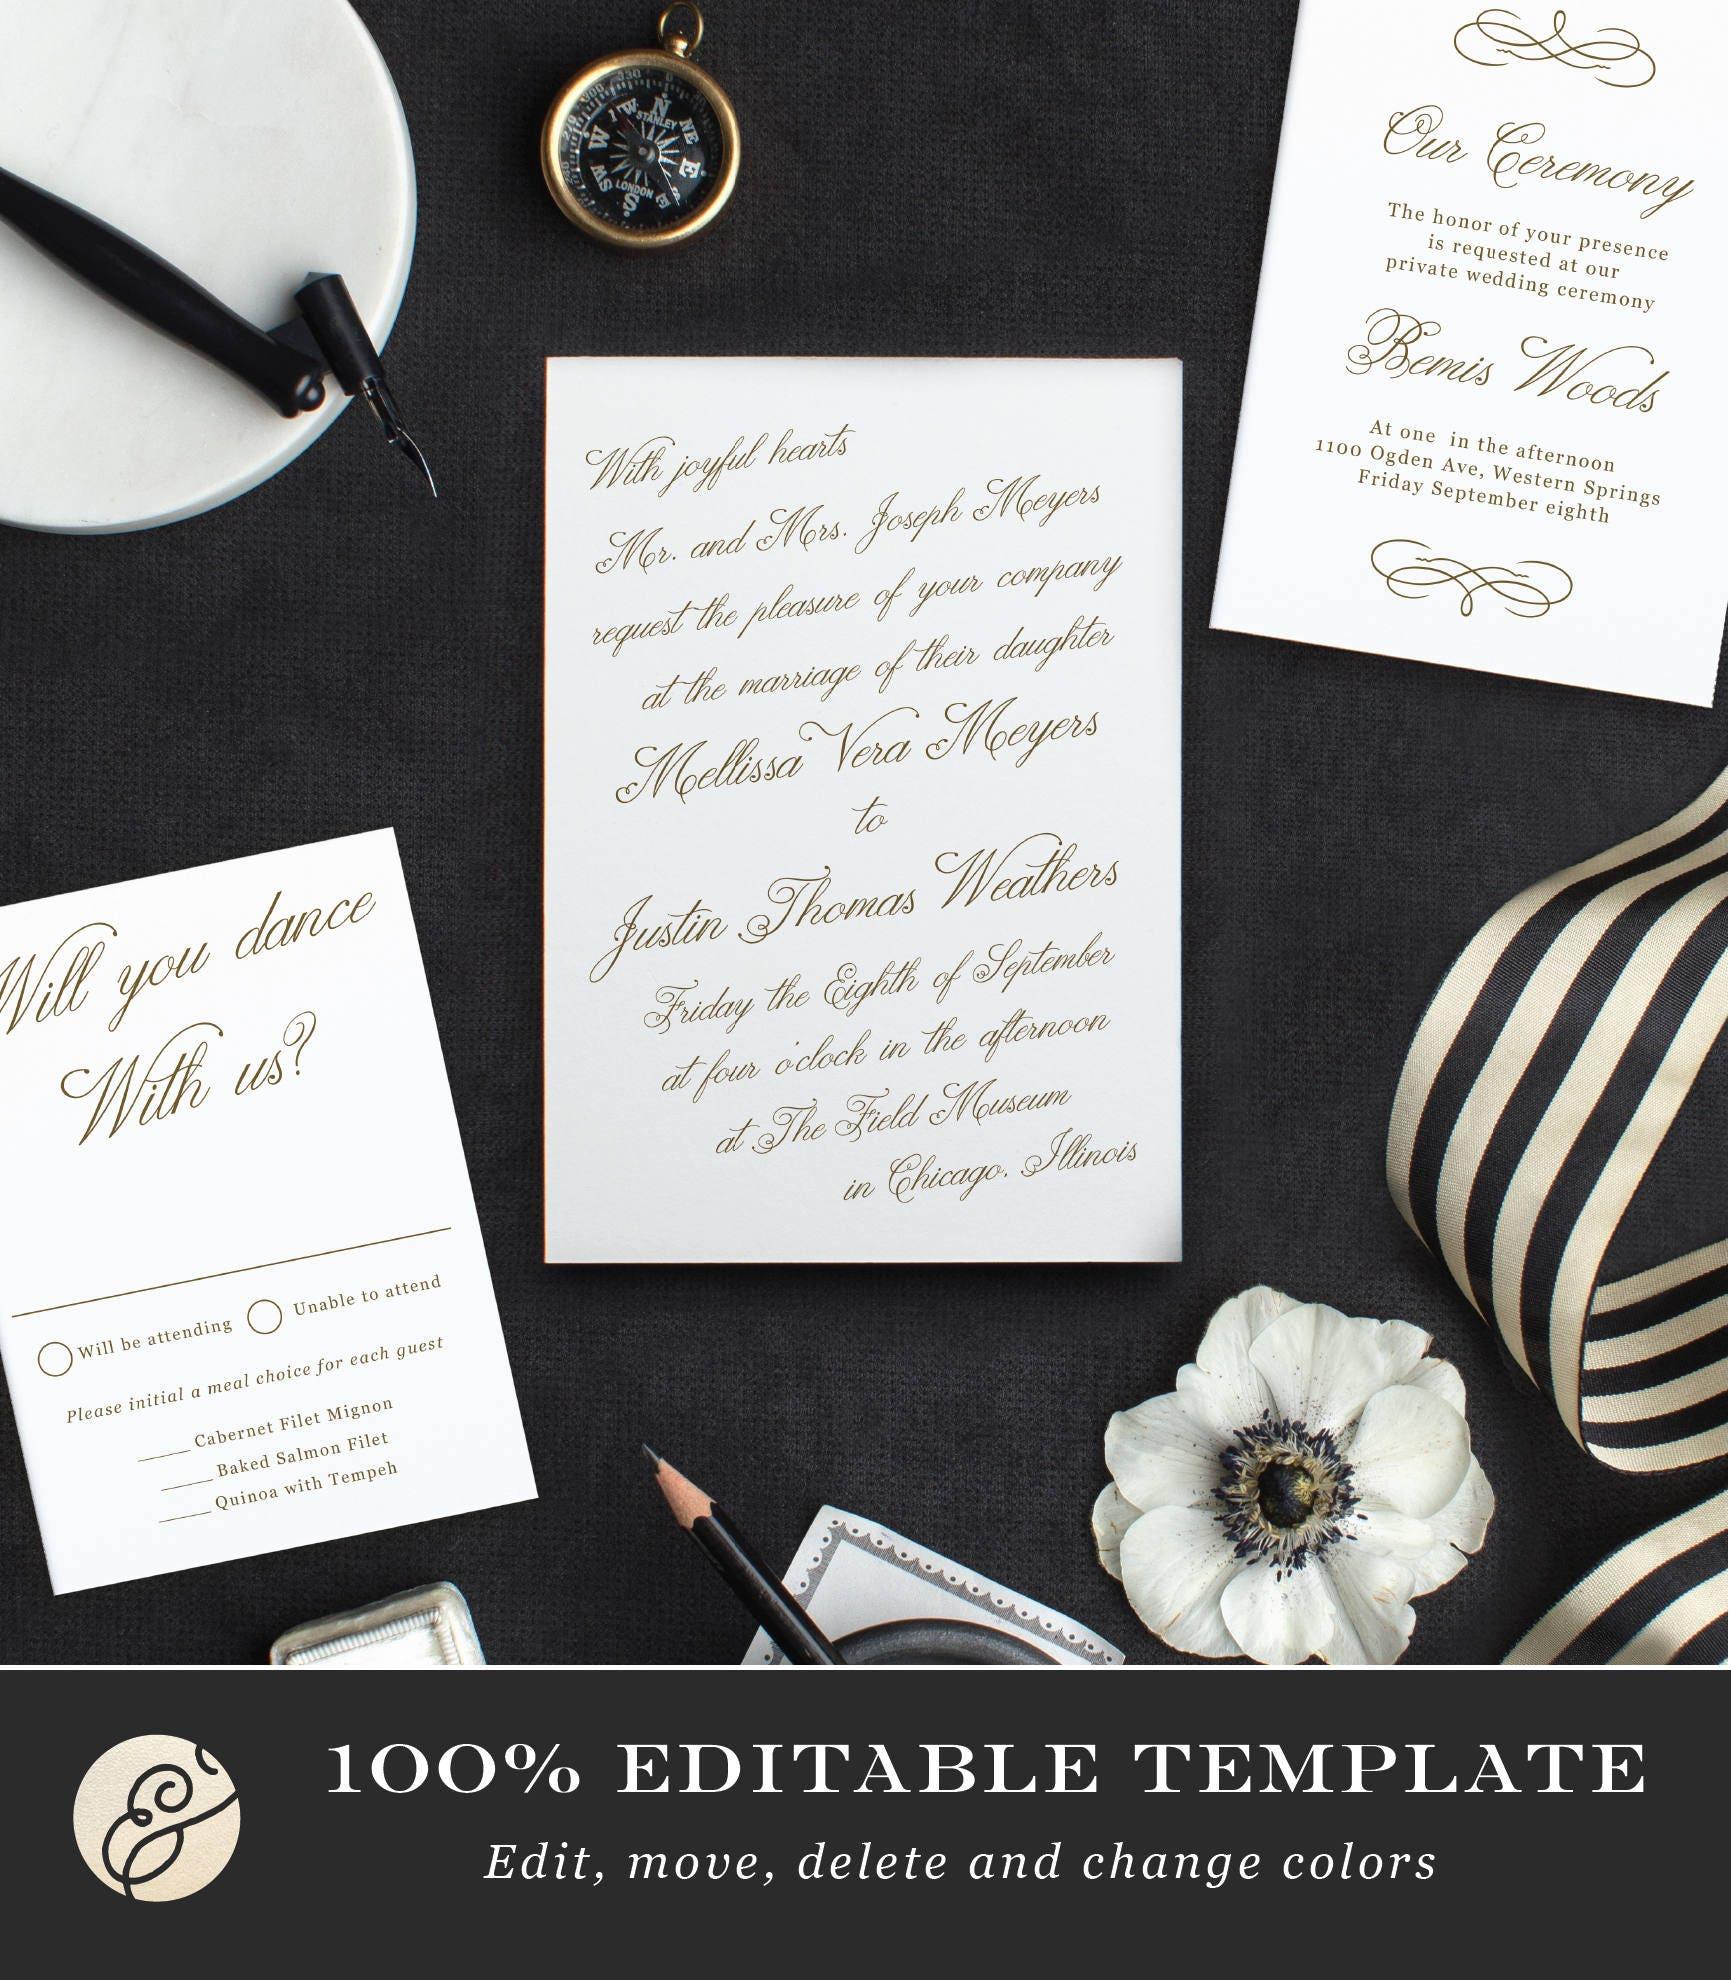 Print Your Own Wedding Invitations: Printable Template Design Your Own Wedding Invitation